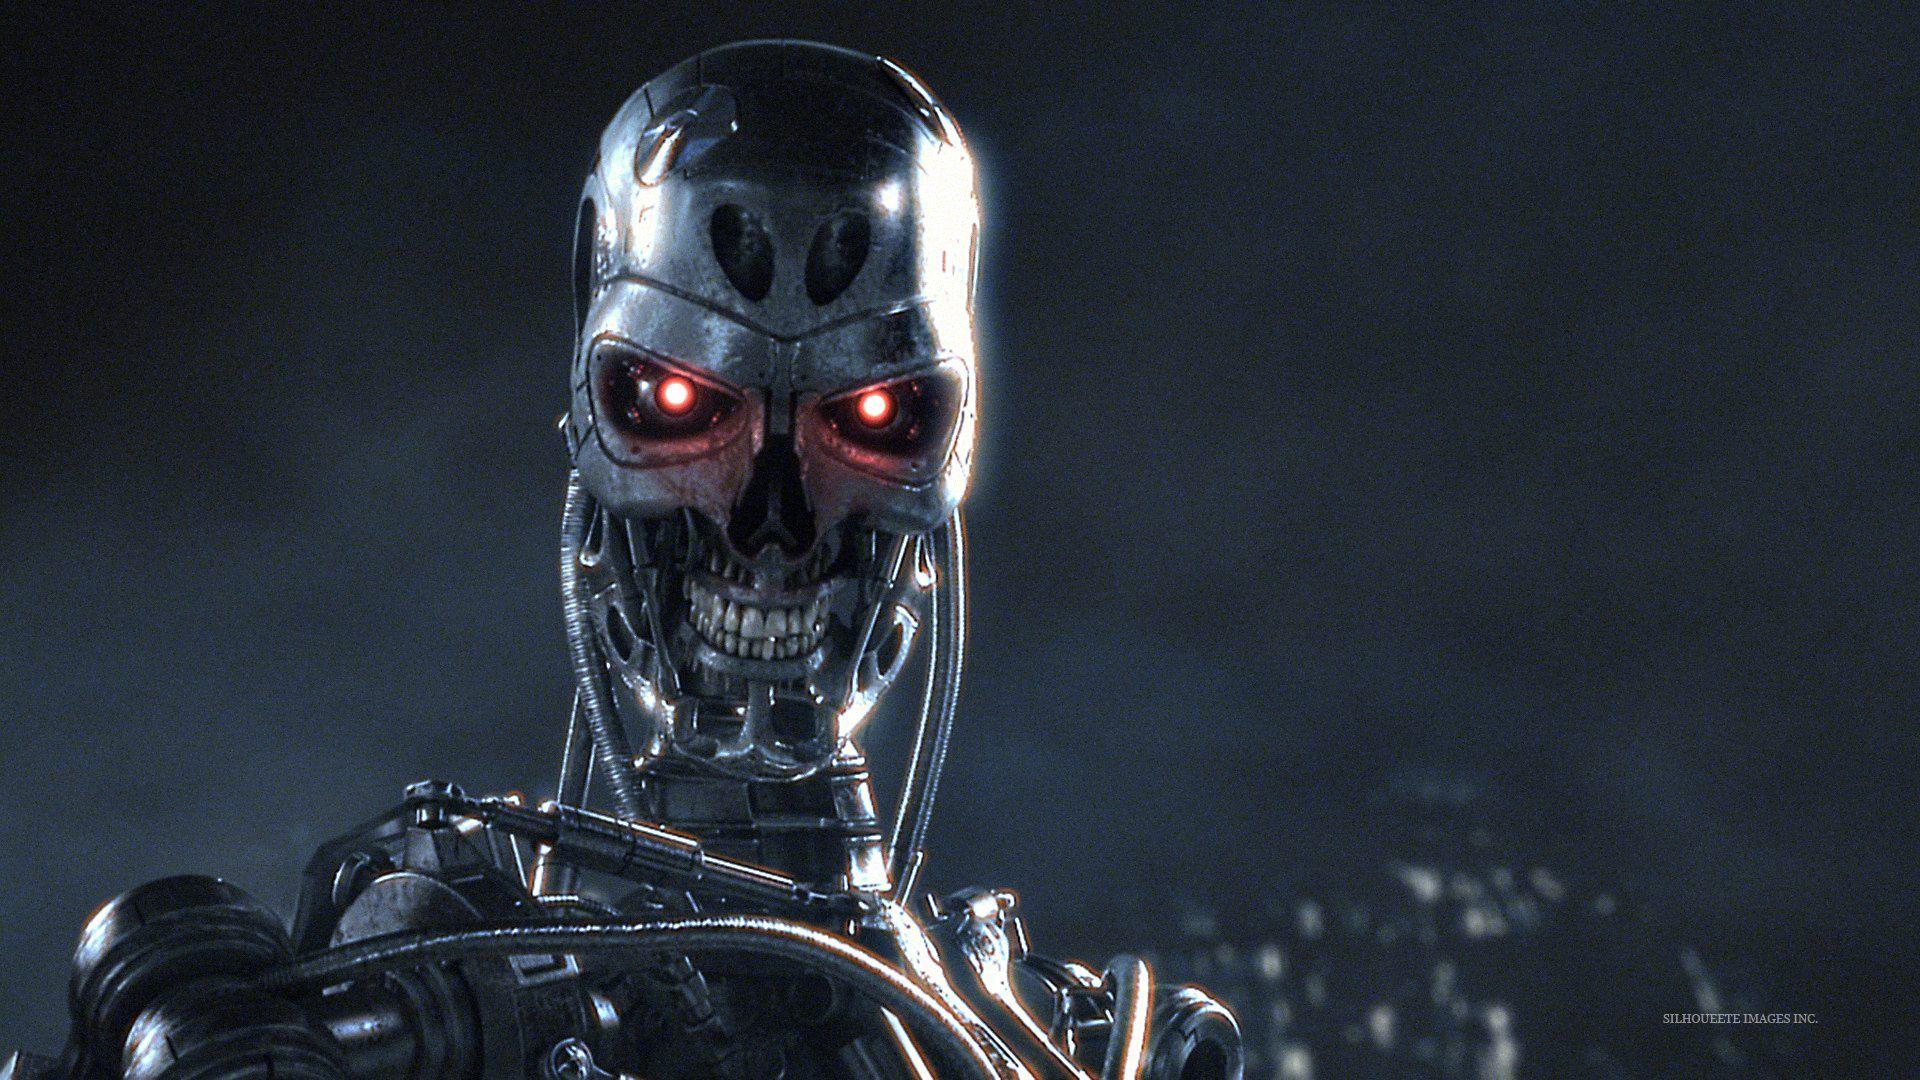 Hd wallpaper robot - Terminator Red Eyes Hd Wallpaper 1920x1080px Wallpaper Robot Movies 38412